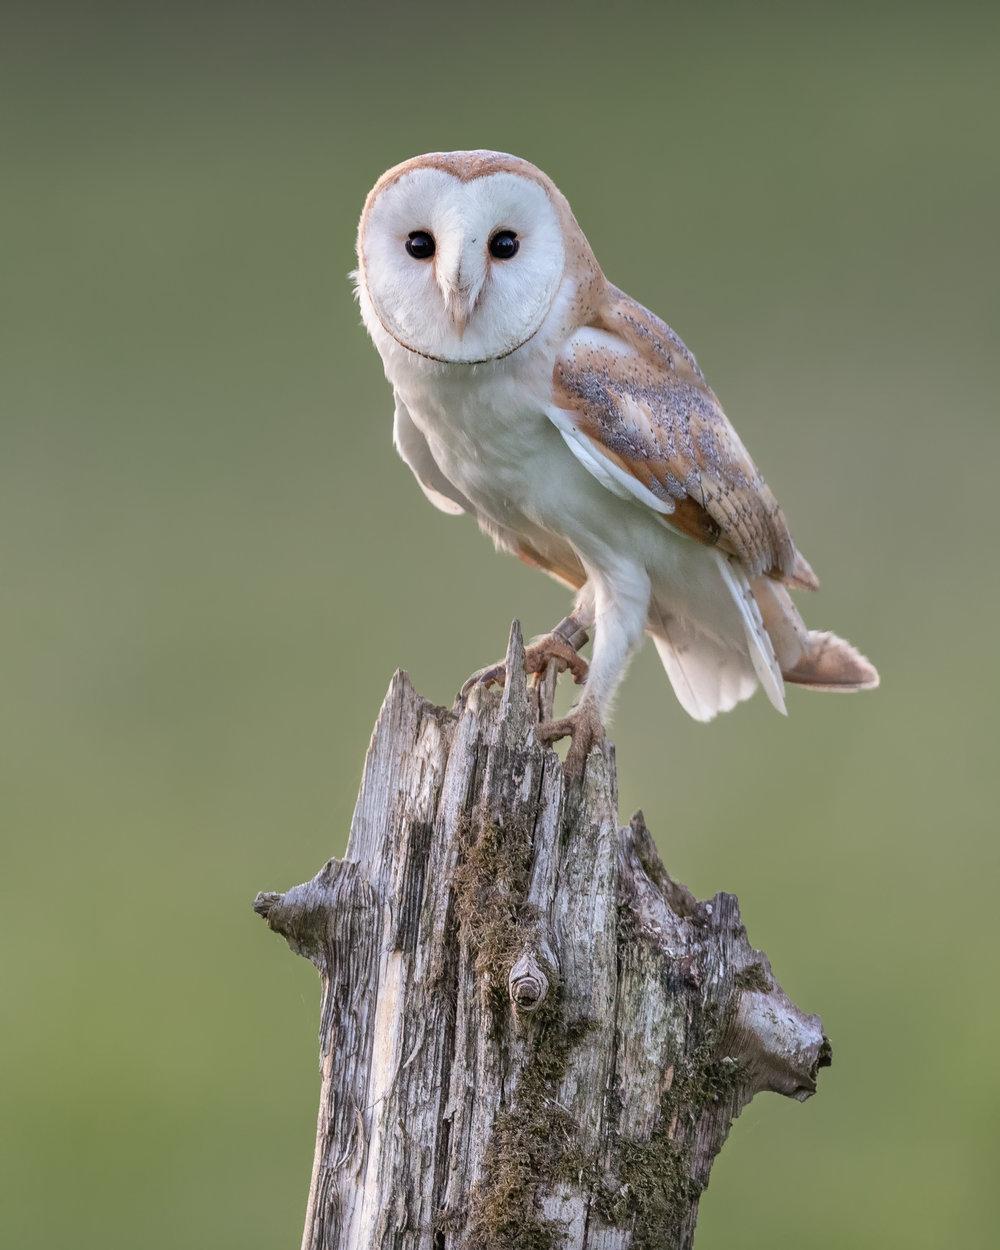 Barn Owl - Intense Stare 14 x 10.jpg